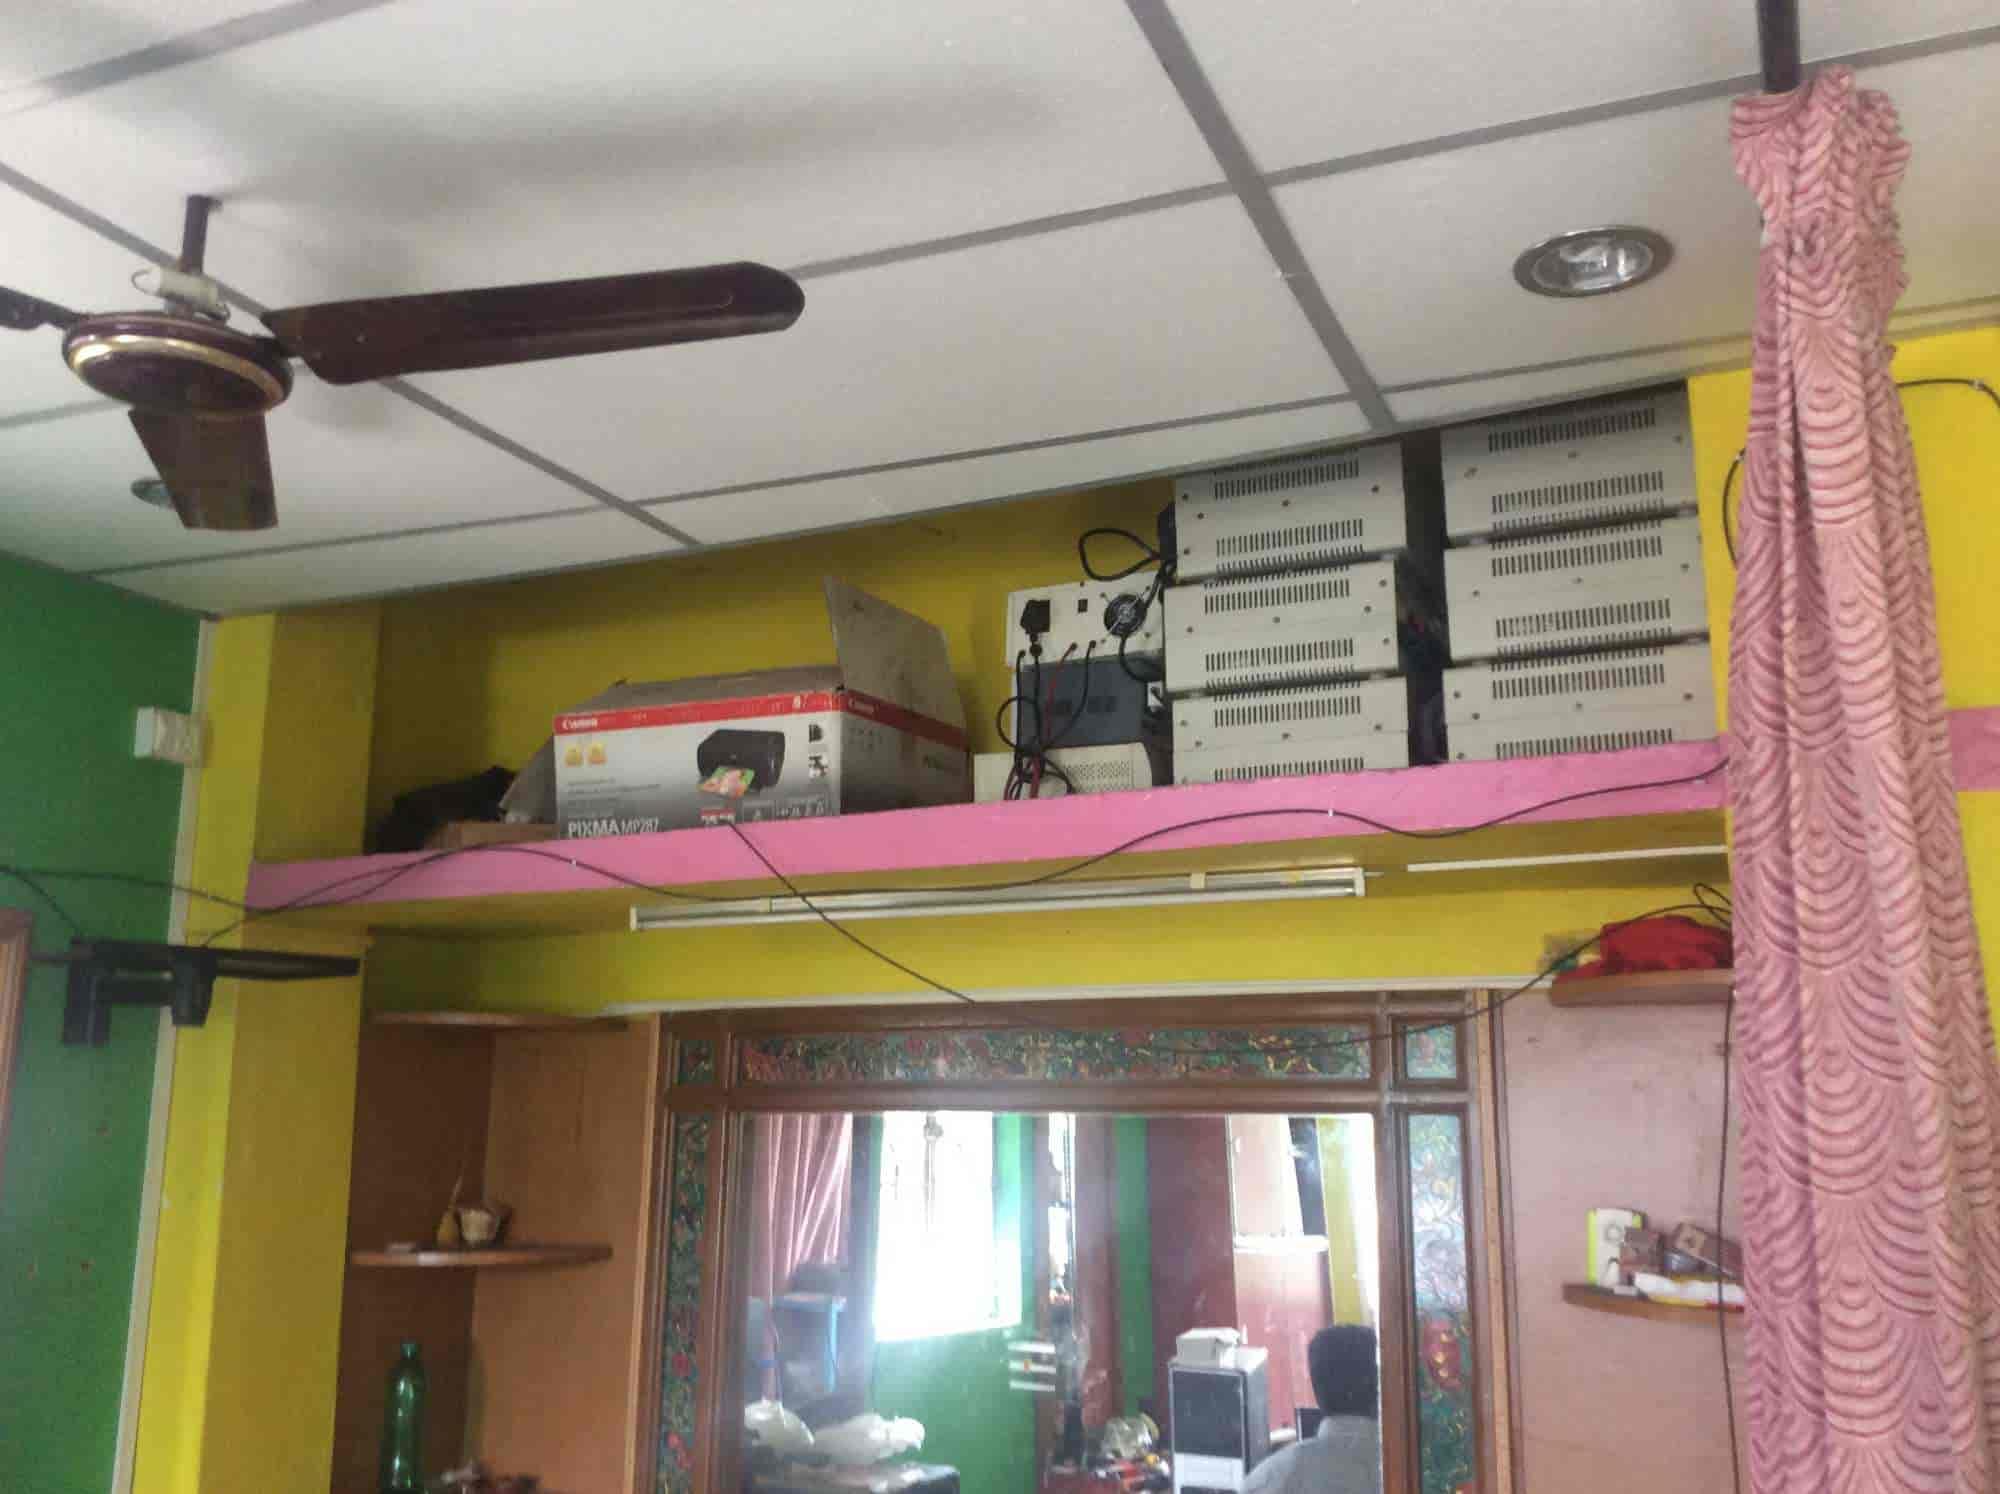 Top Lg Split Ac Repair & Services in Saravanampatti - Best